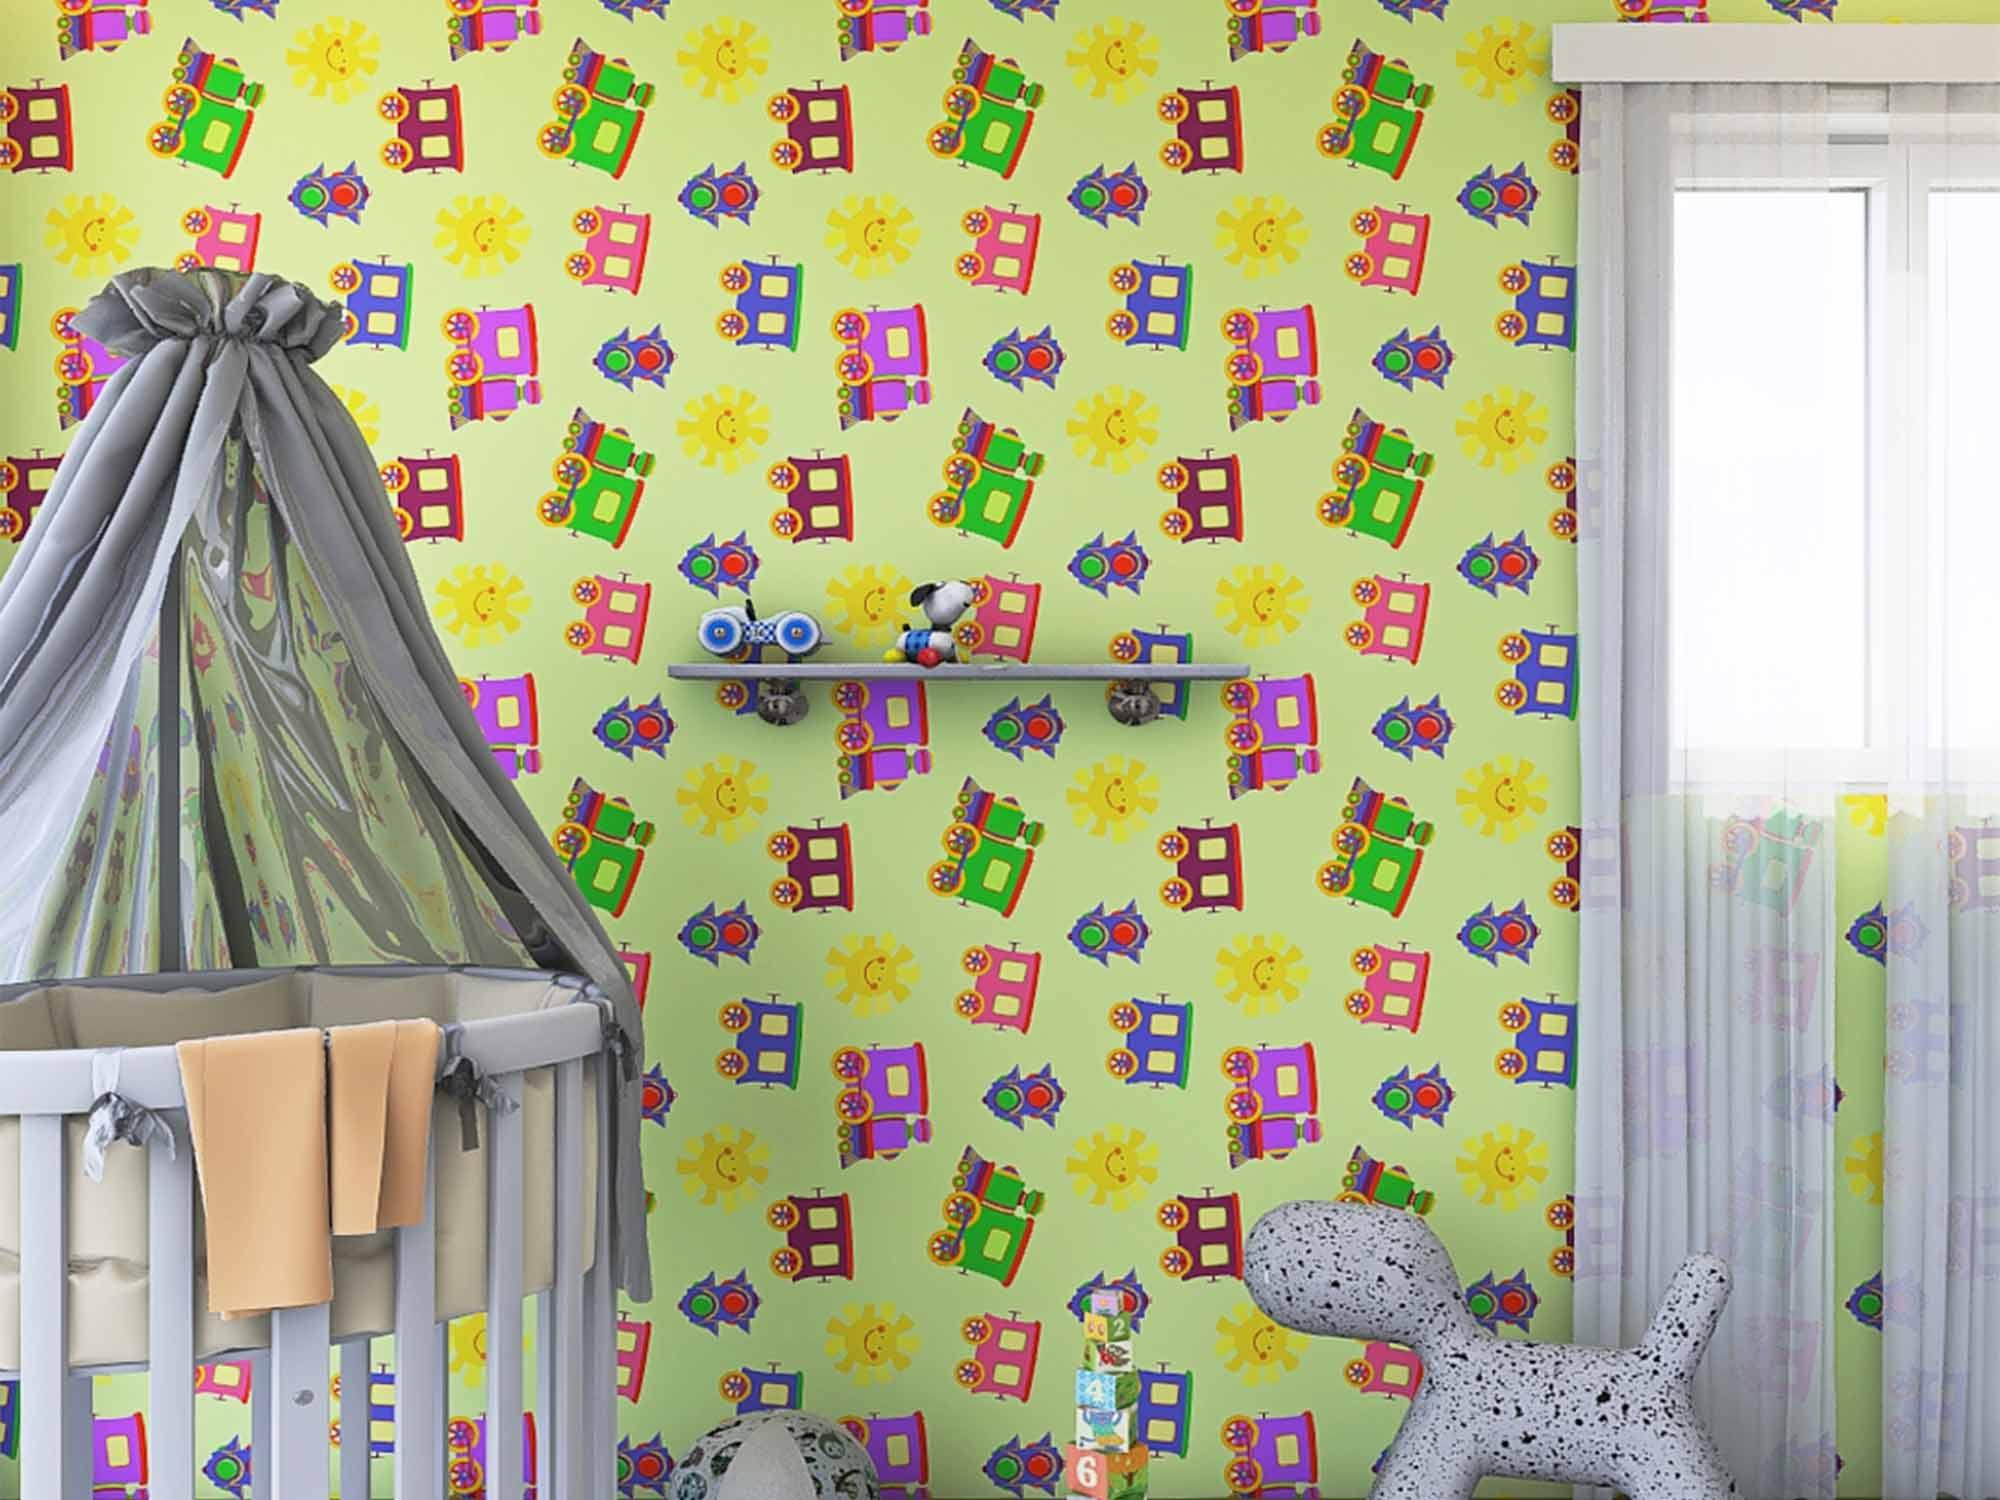 Papel de Parede Infantil 0007 - Adesivos de Parede  - Paredes Decoradas